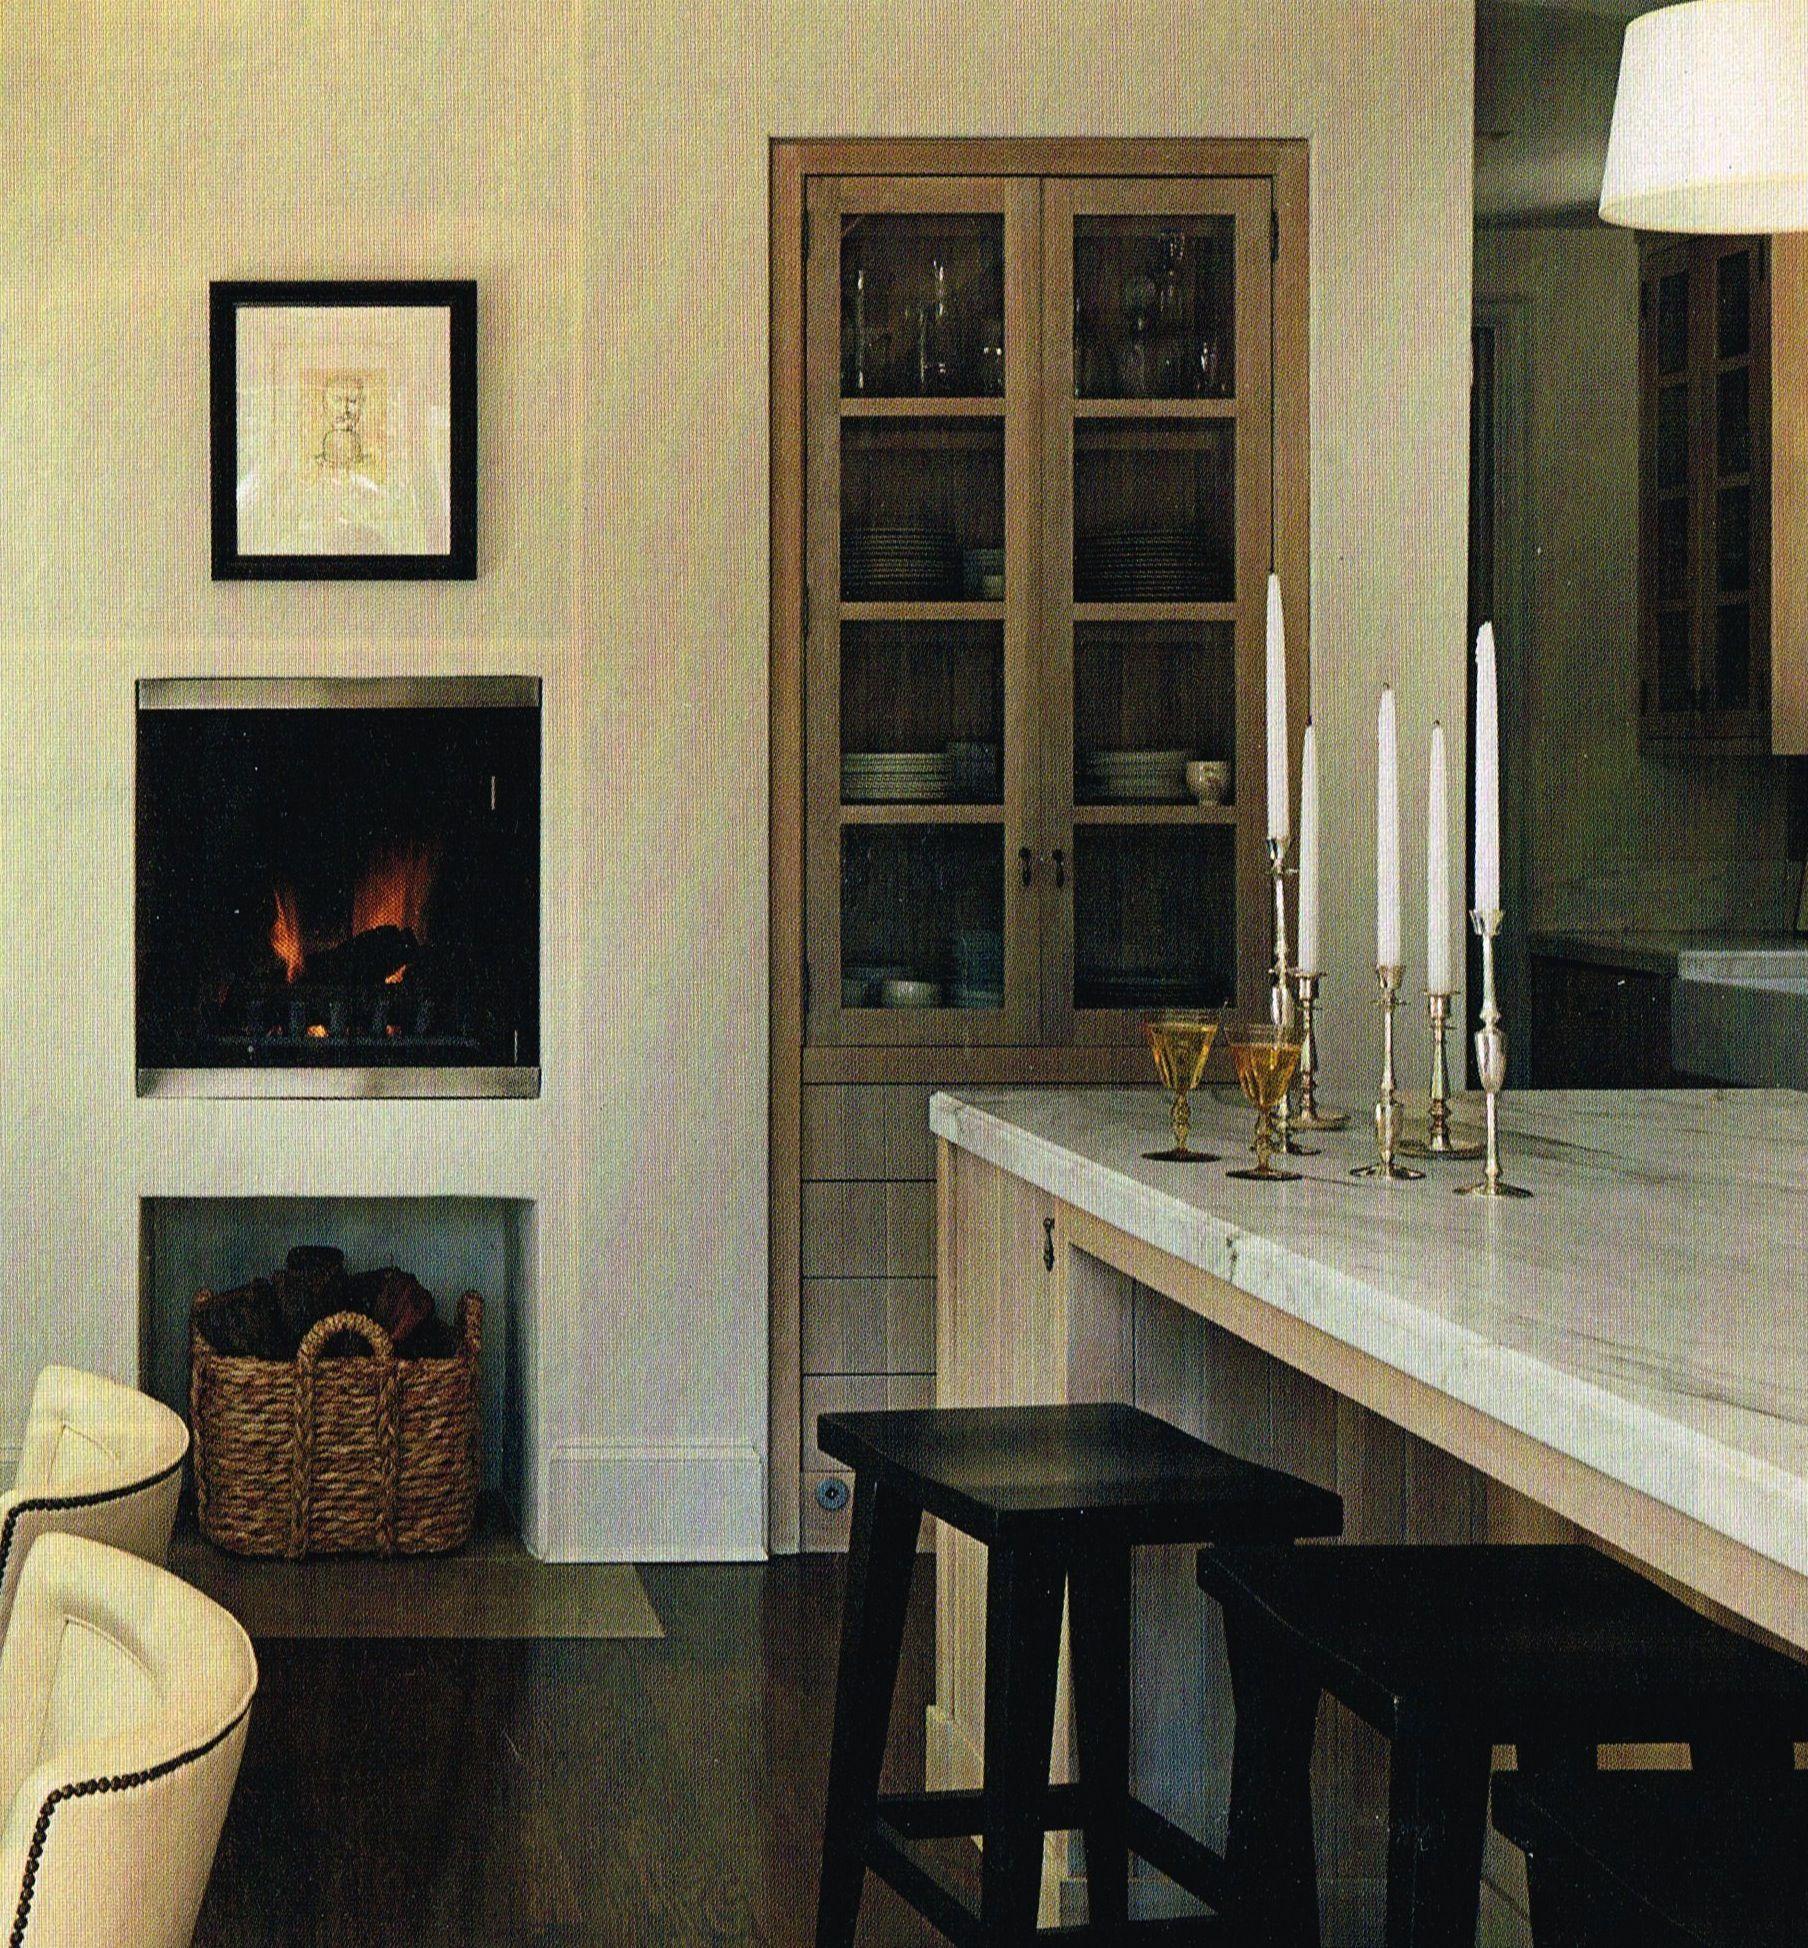 Rustic Elegant Kitchen: Balance Of Rustic, Modern, And Elegant